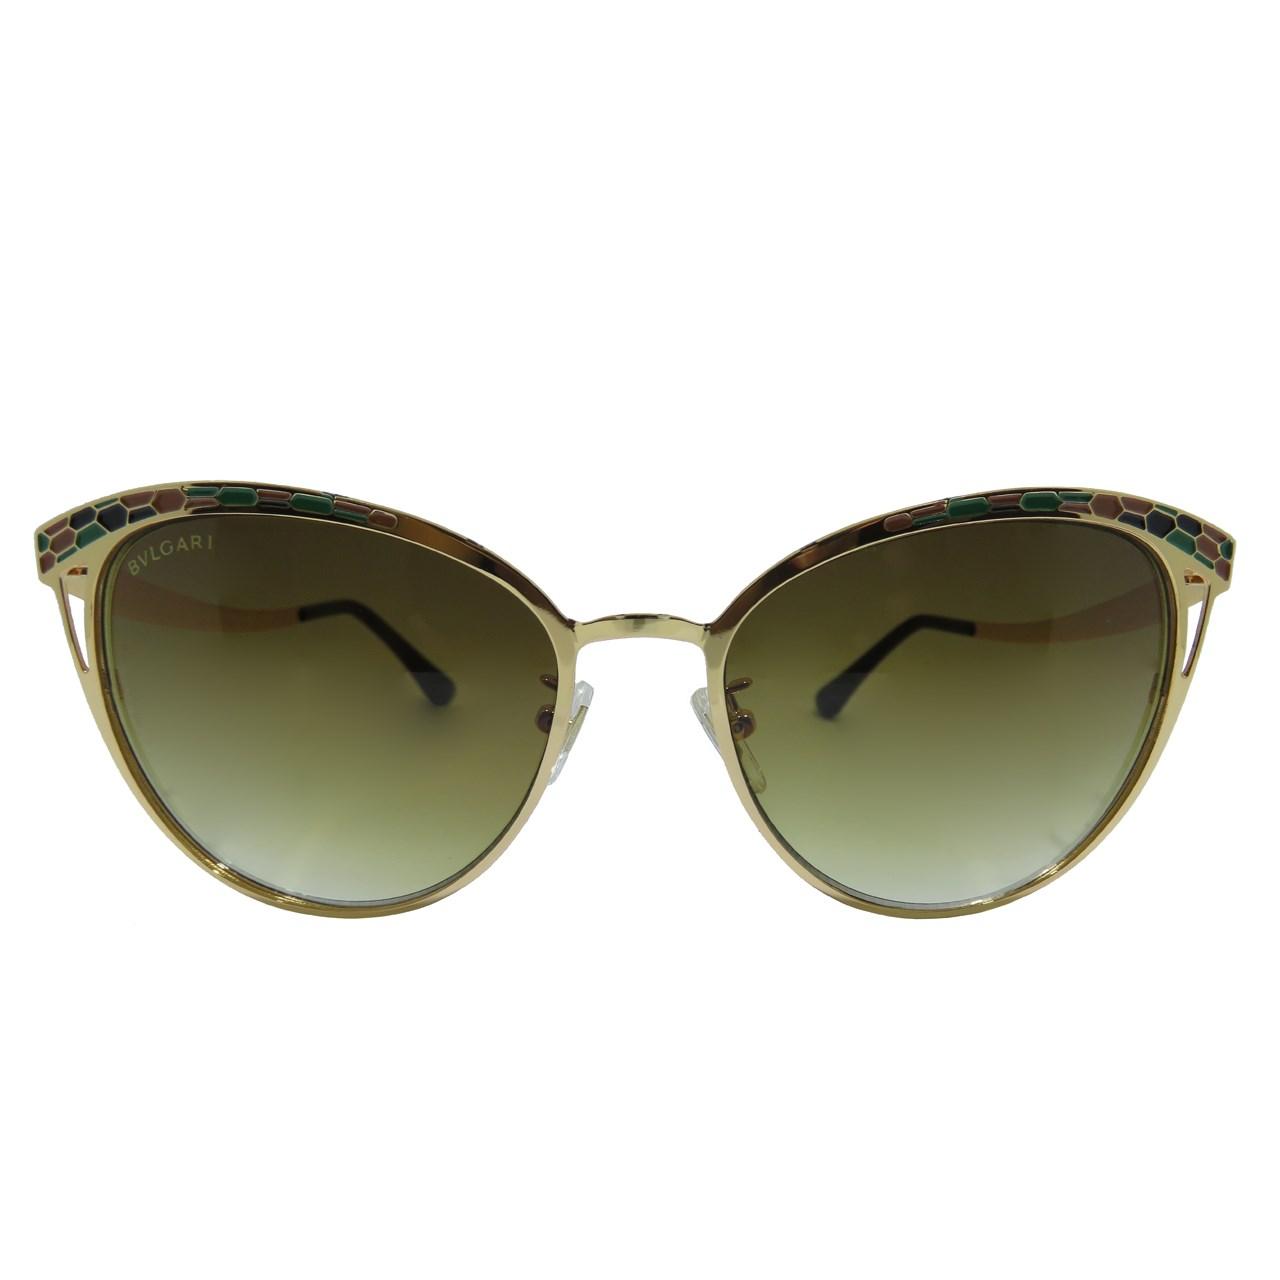 عینک آفتابی بولگاری مدل BV6083 2016/6G 2N-Original 19 -  - 1